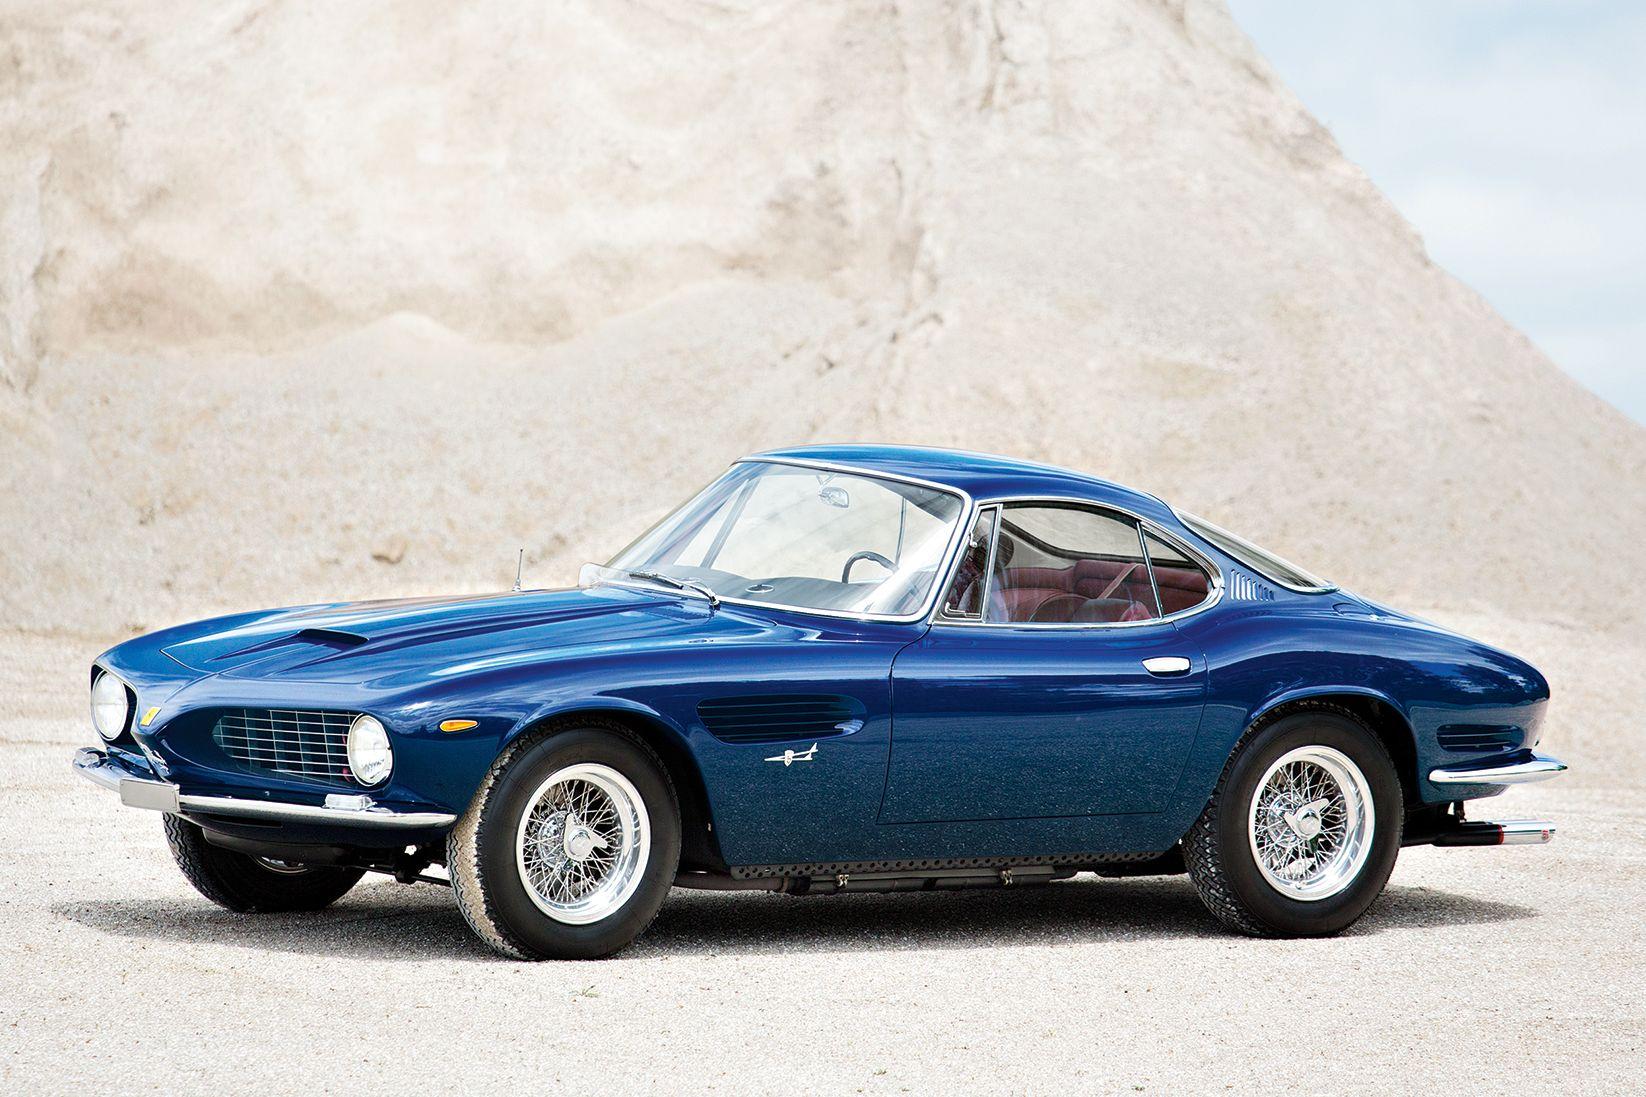 1962_Ferrari_250_GT_SWB_Berlinetta_Speciale_0205_BH-1